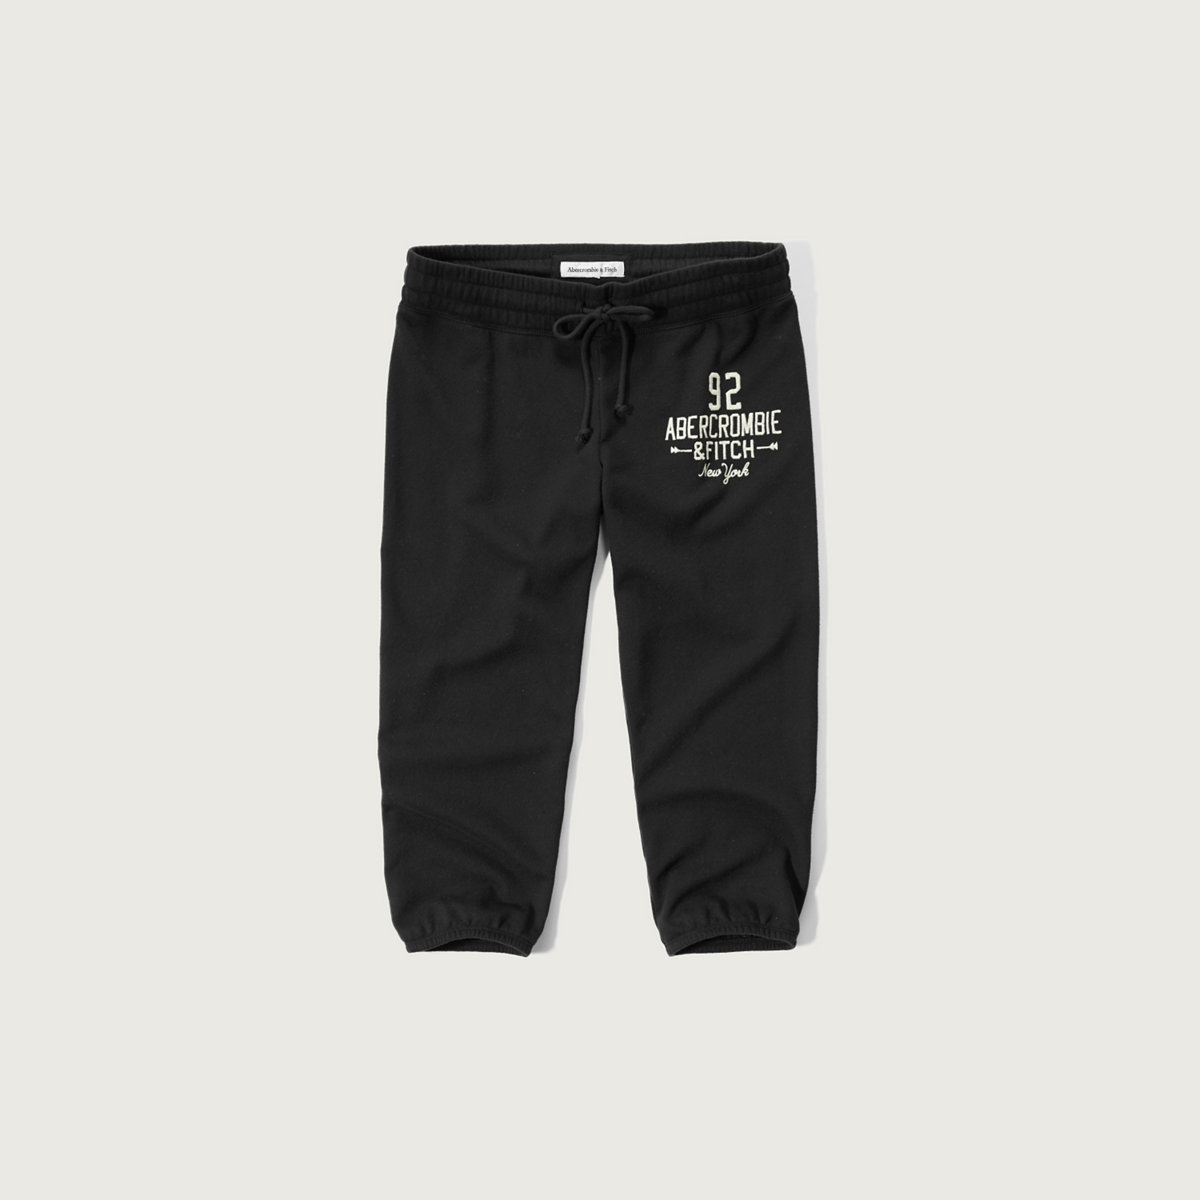 A&F Banded Crop Sweatpants